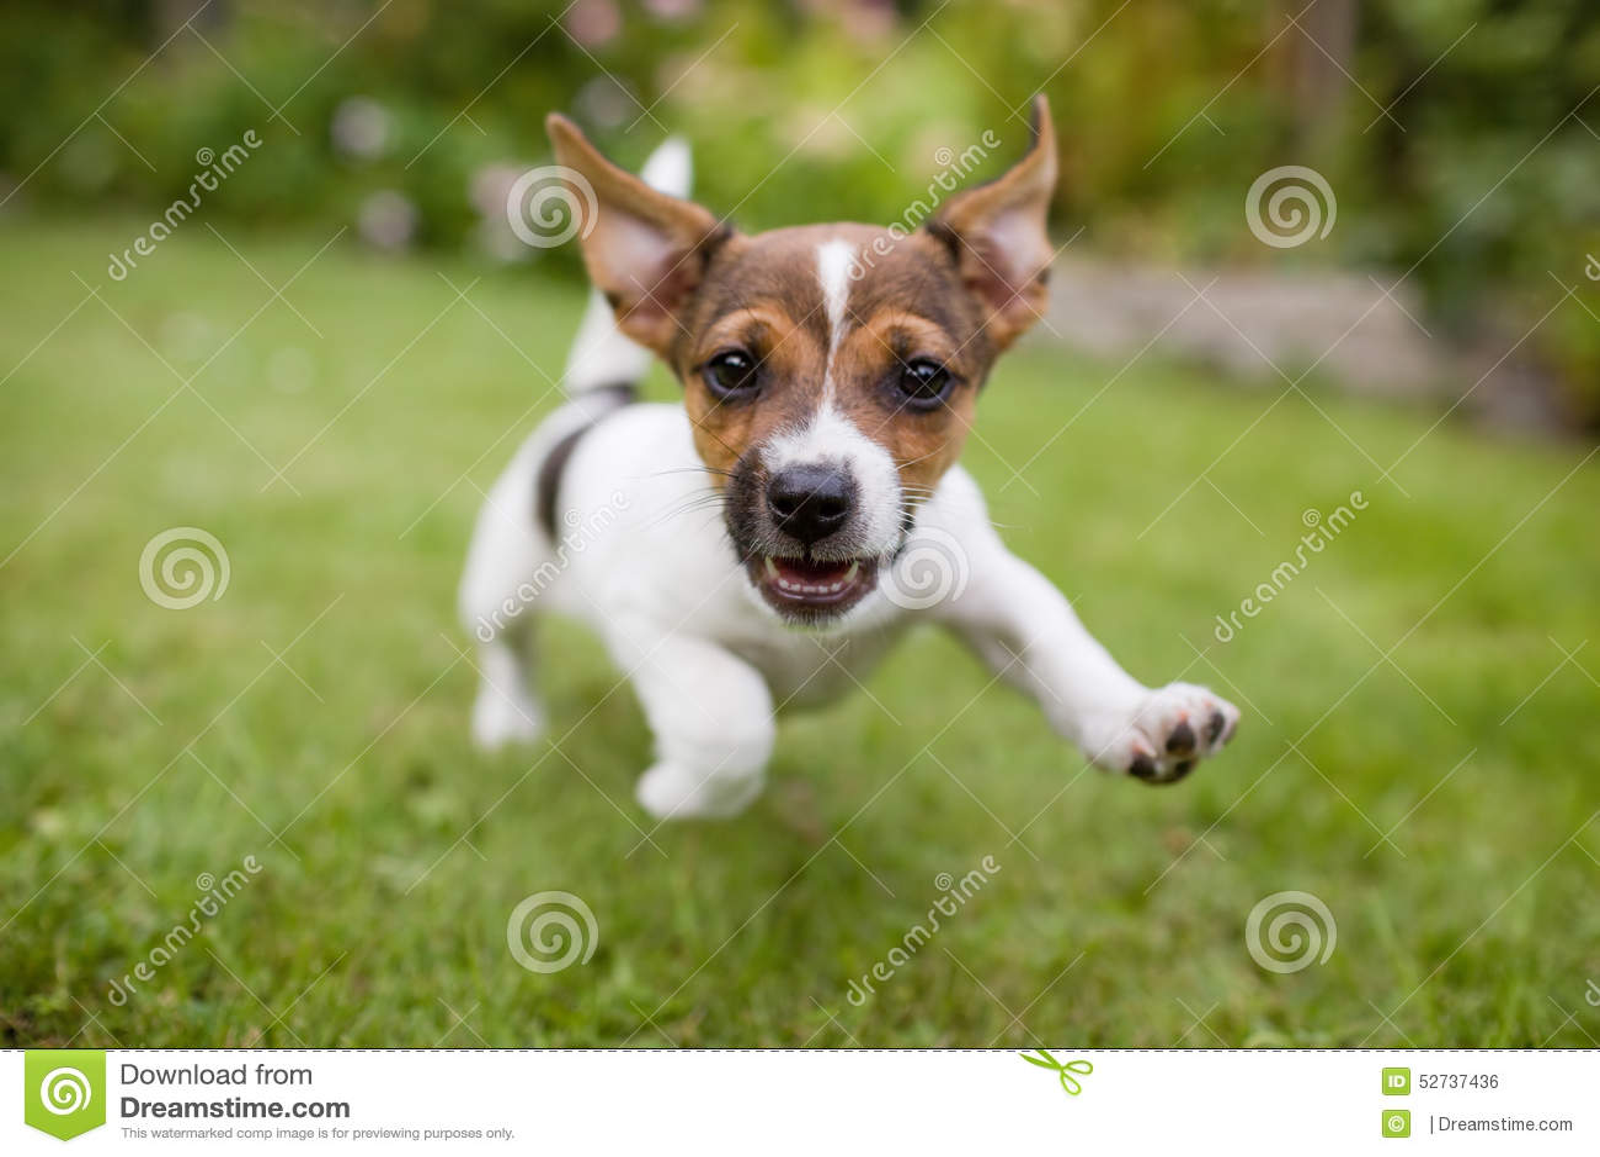 Funny Happy running puppy dog